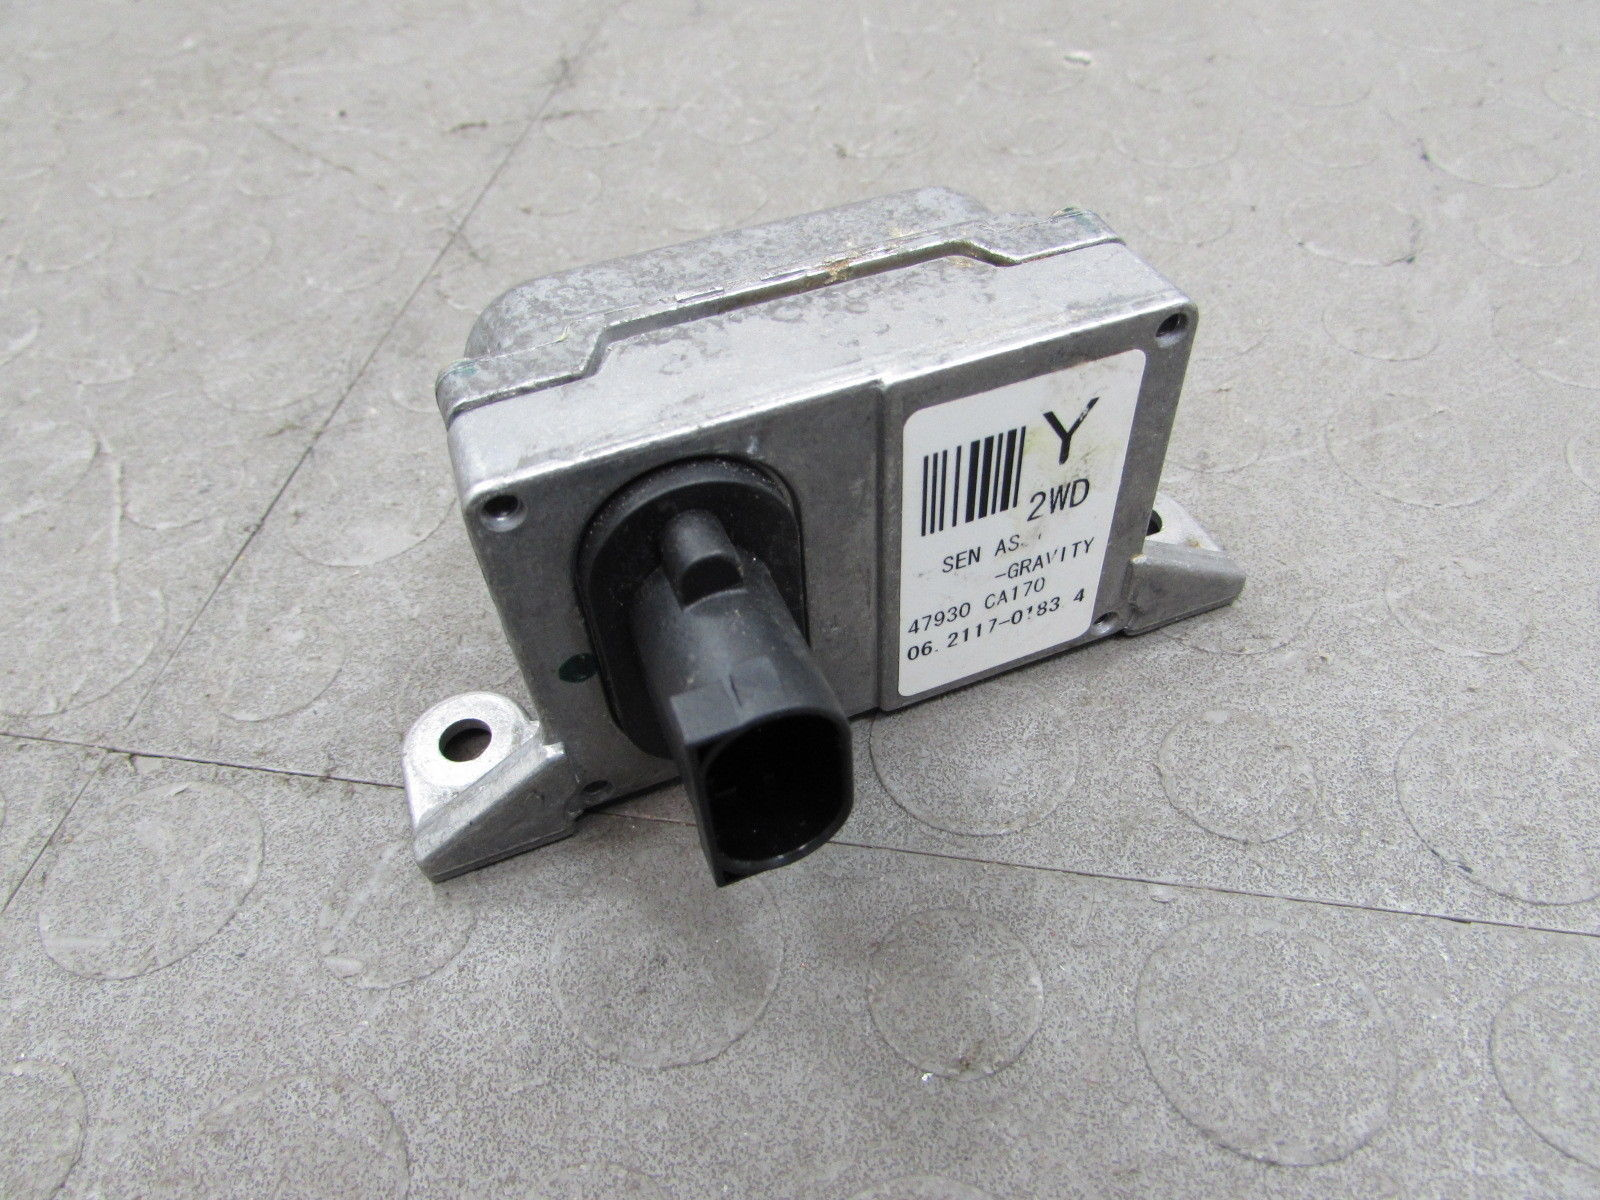 04-07 Nissan Murano 2WD Anti-Skid Yaw Rate Gravity Sensor 47930-CA170 B